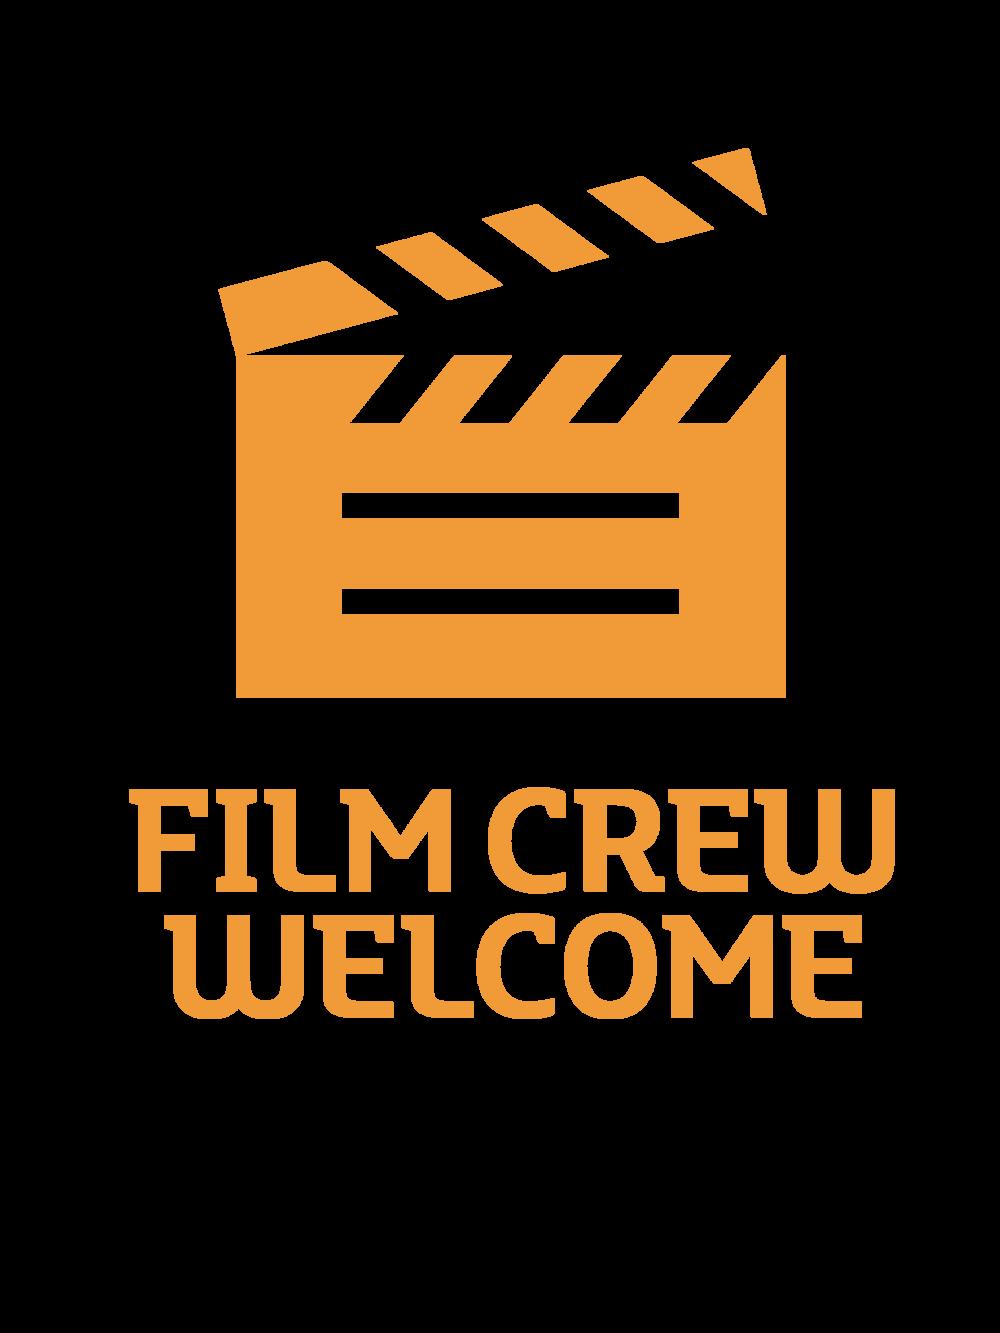 Film Crew welcome.jpg